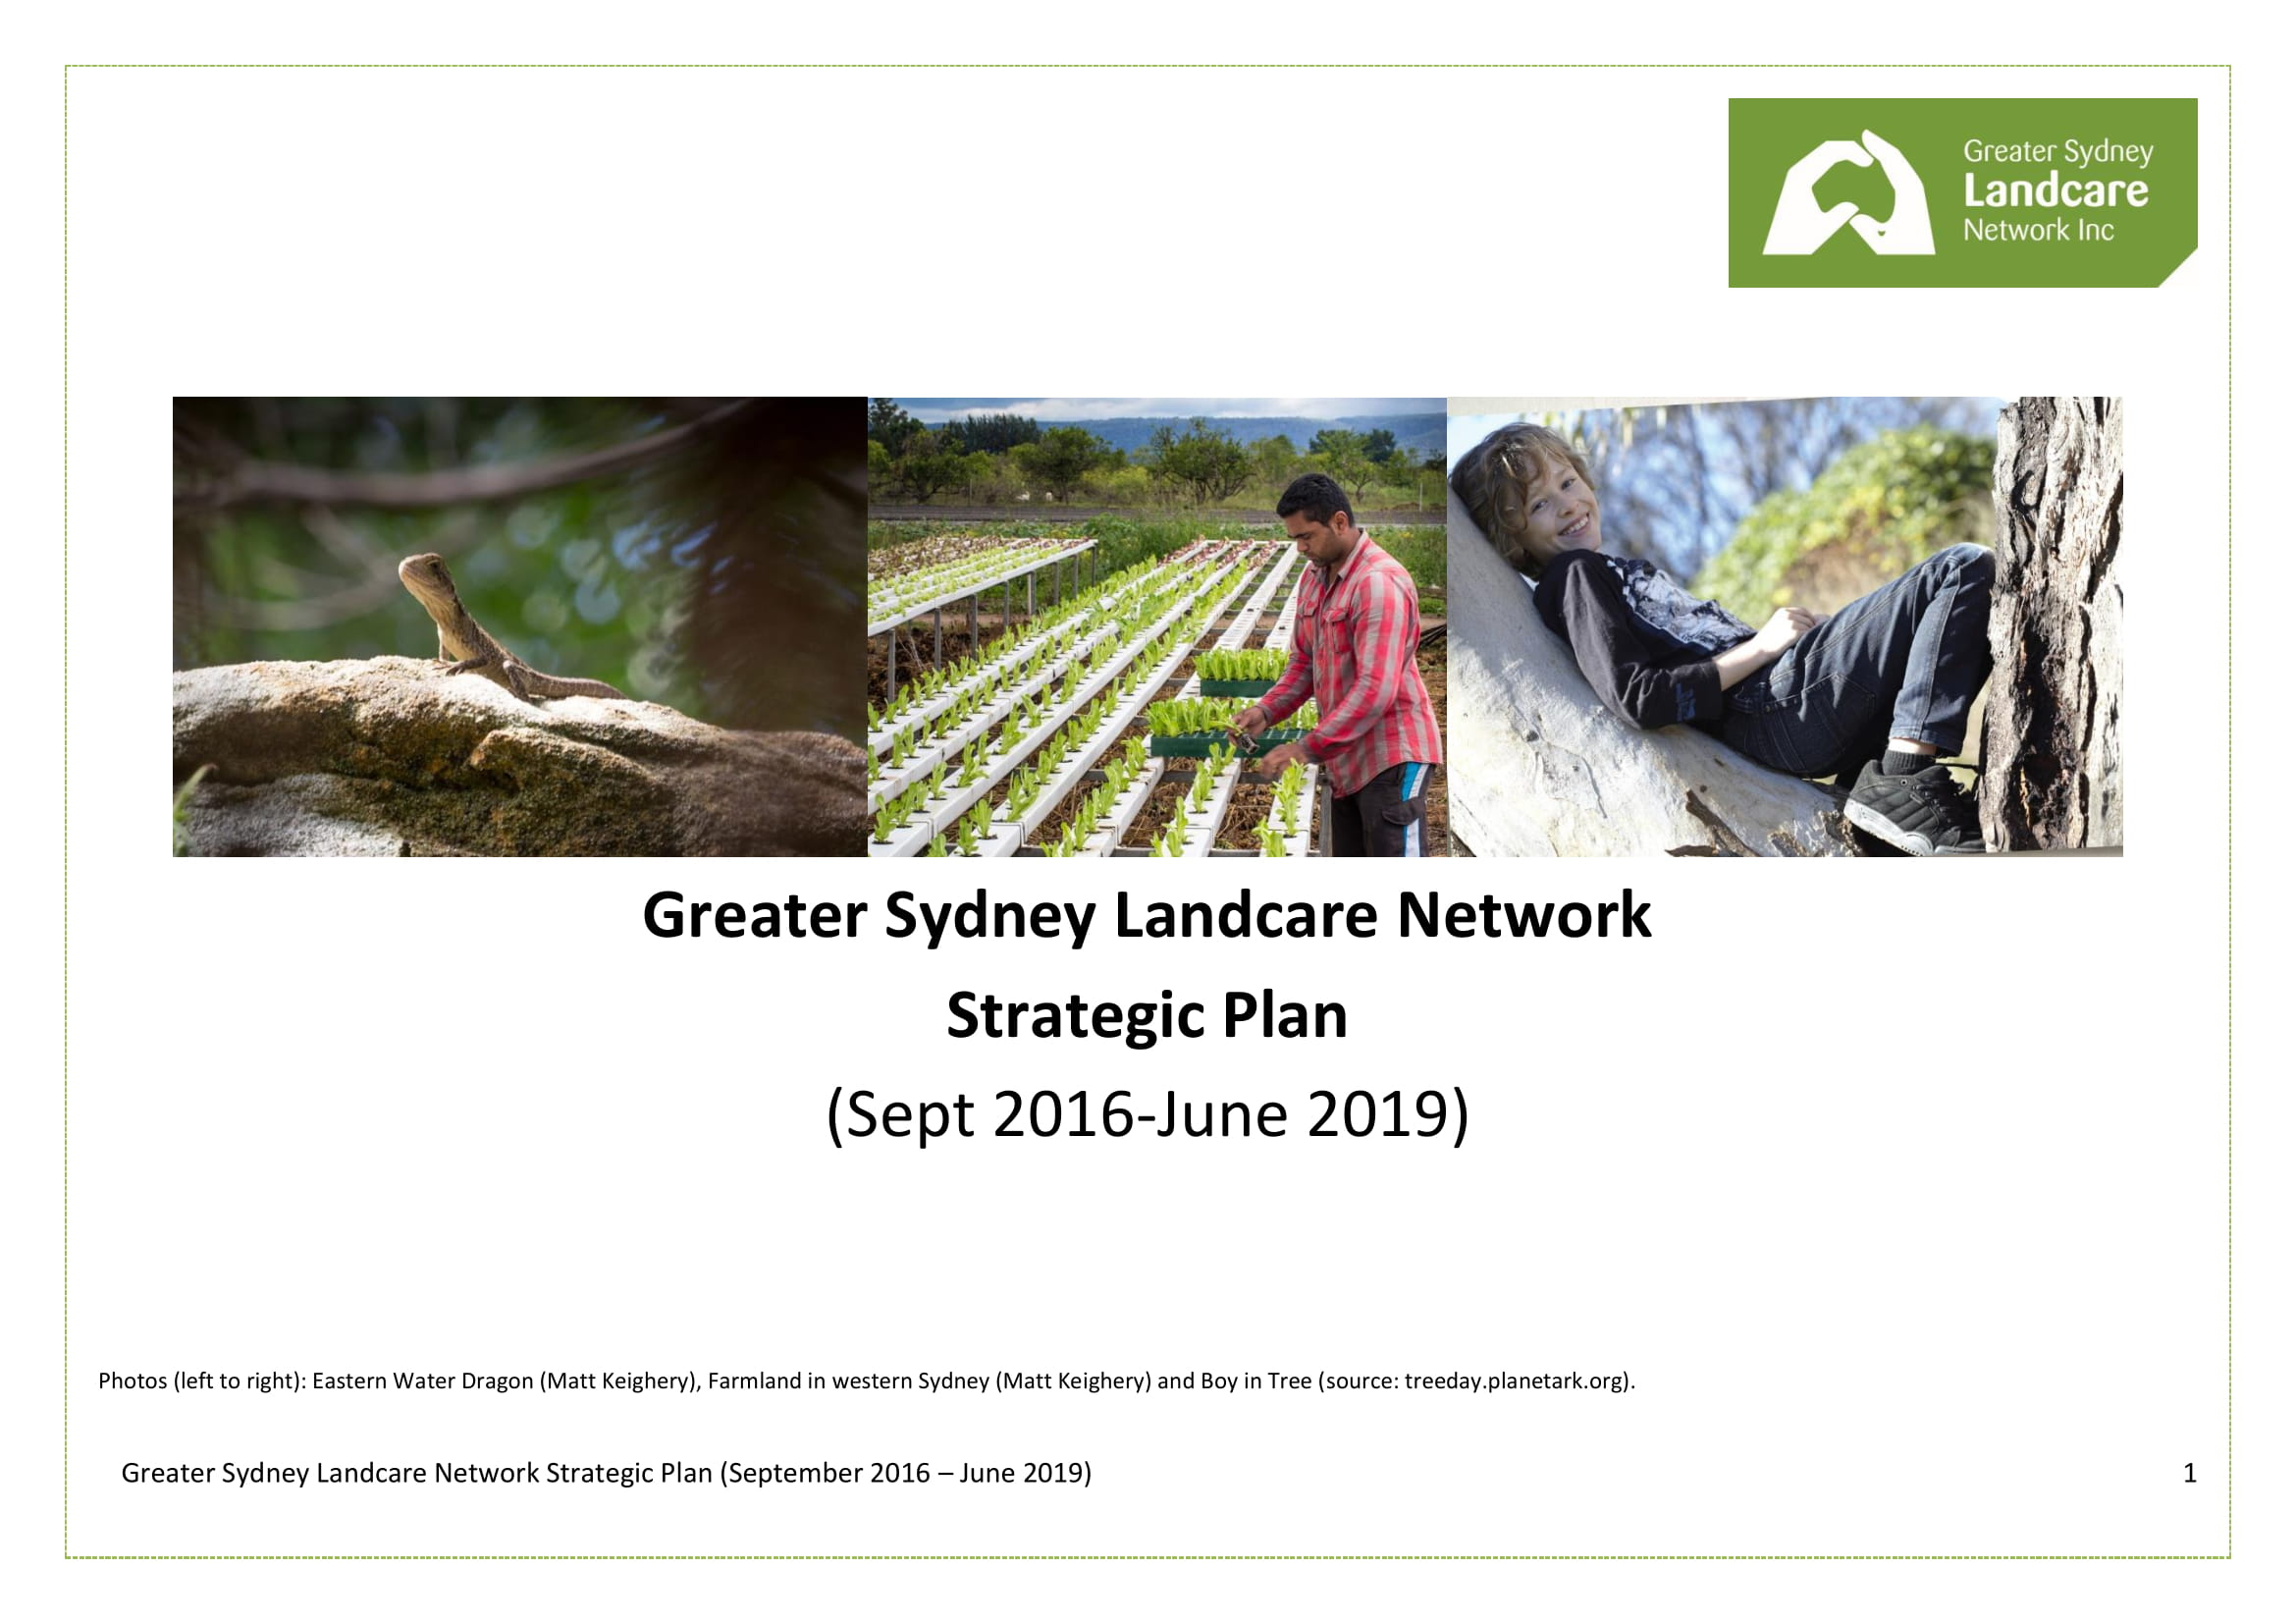 greater sydney landcare network strategic plan example